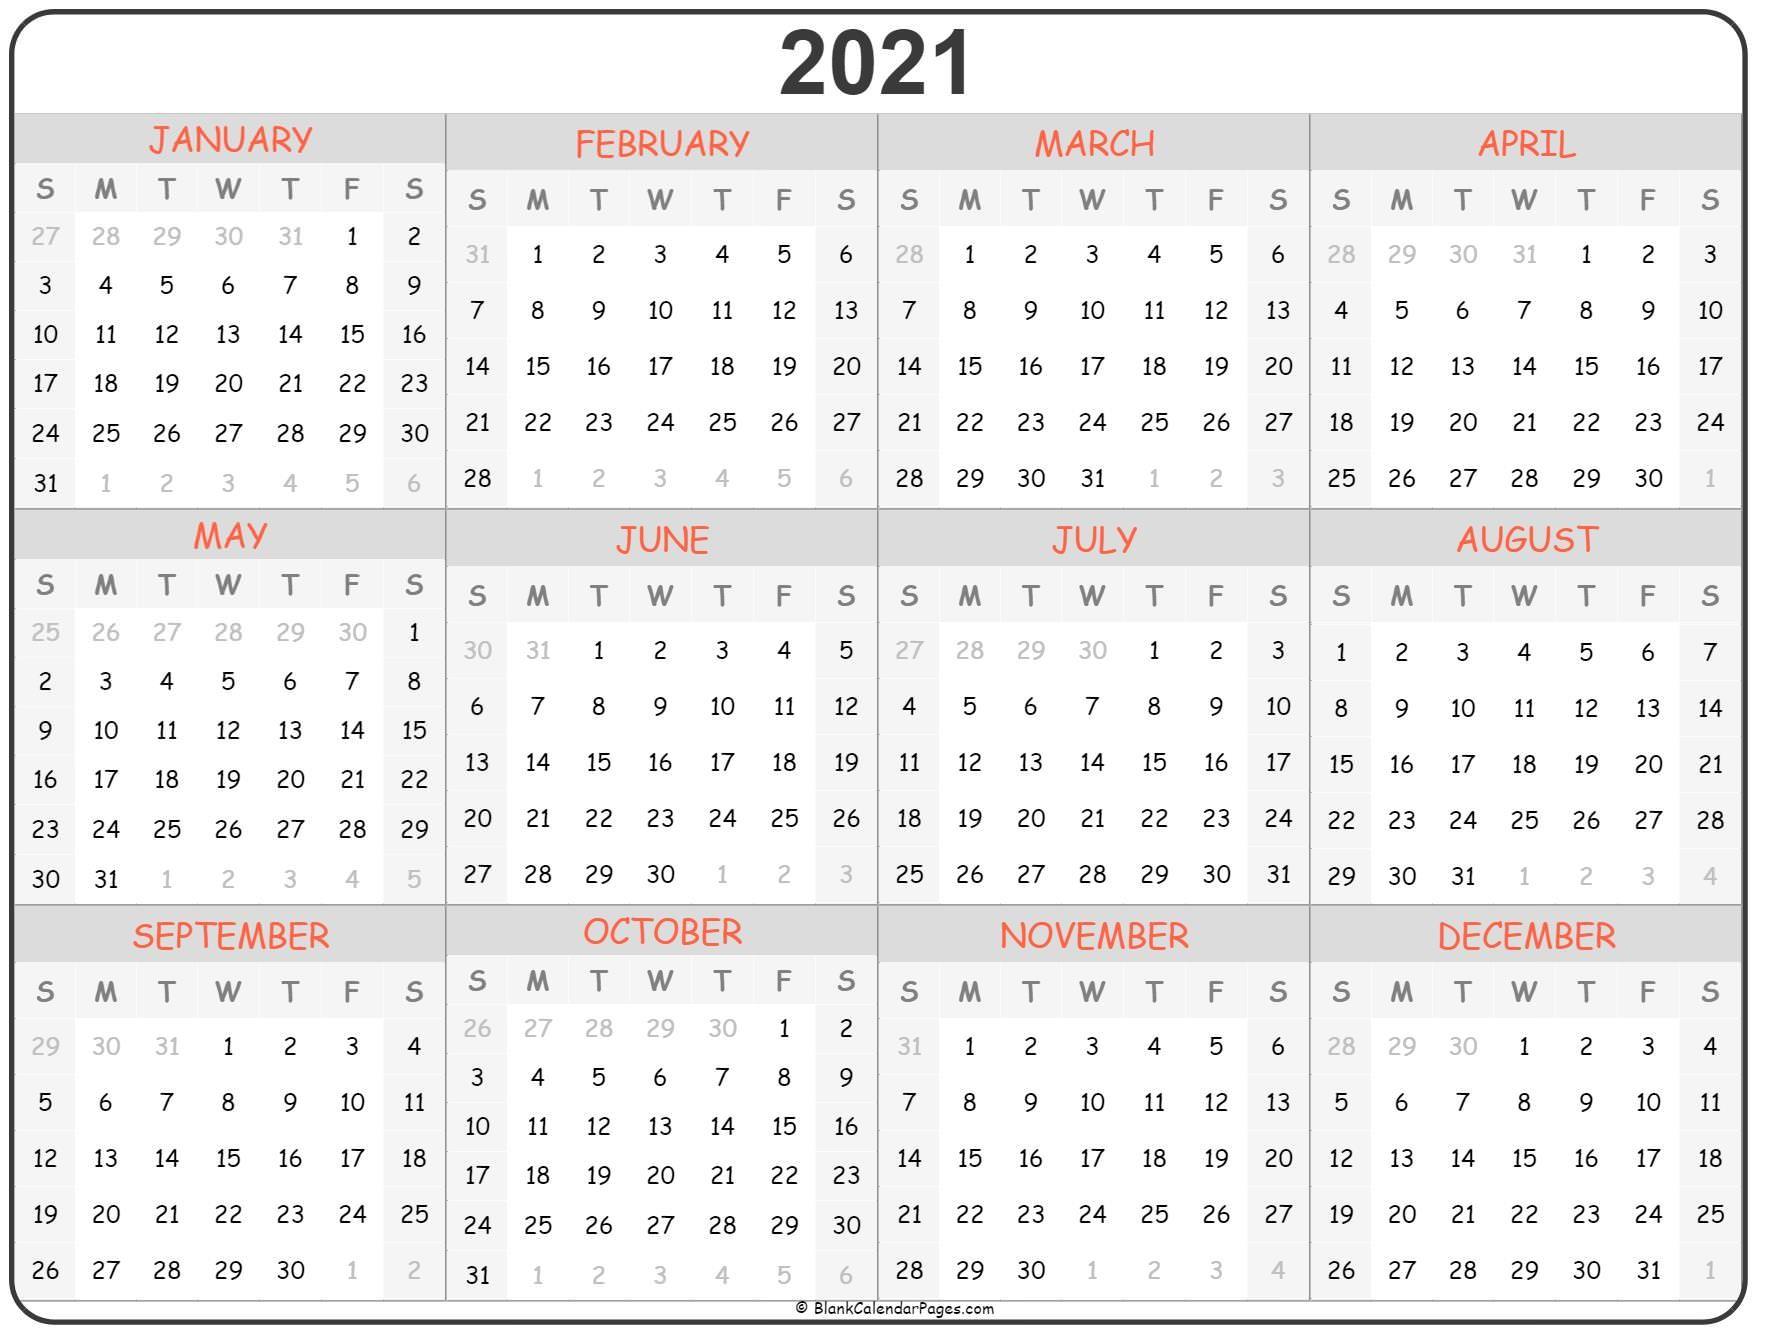 2021 year calendar